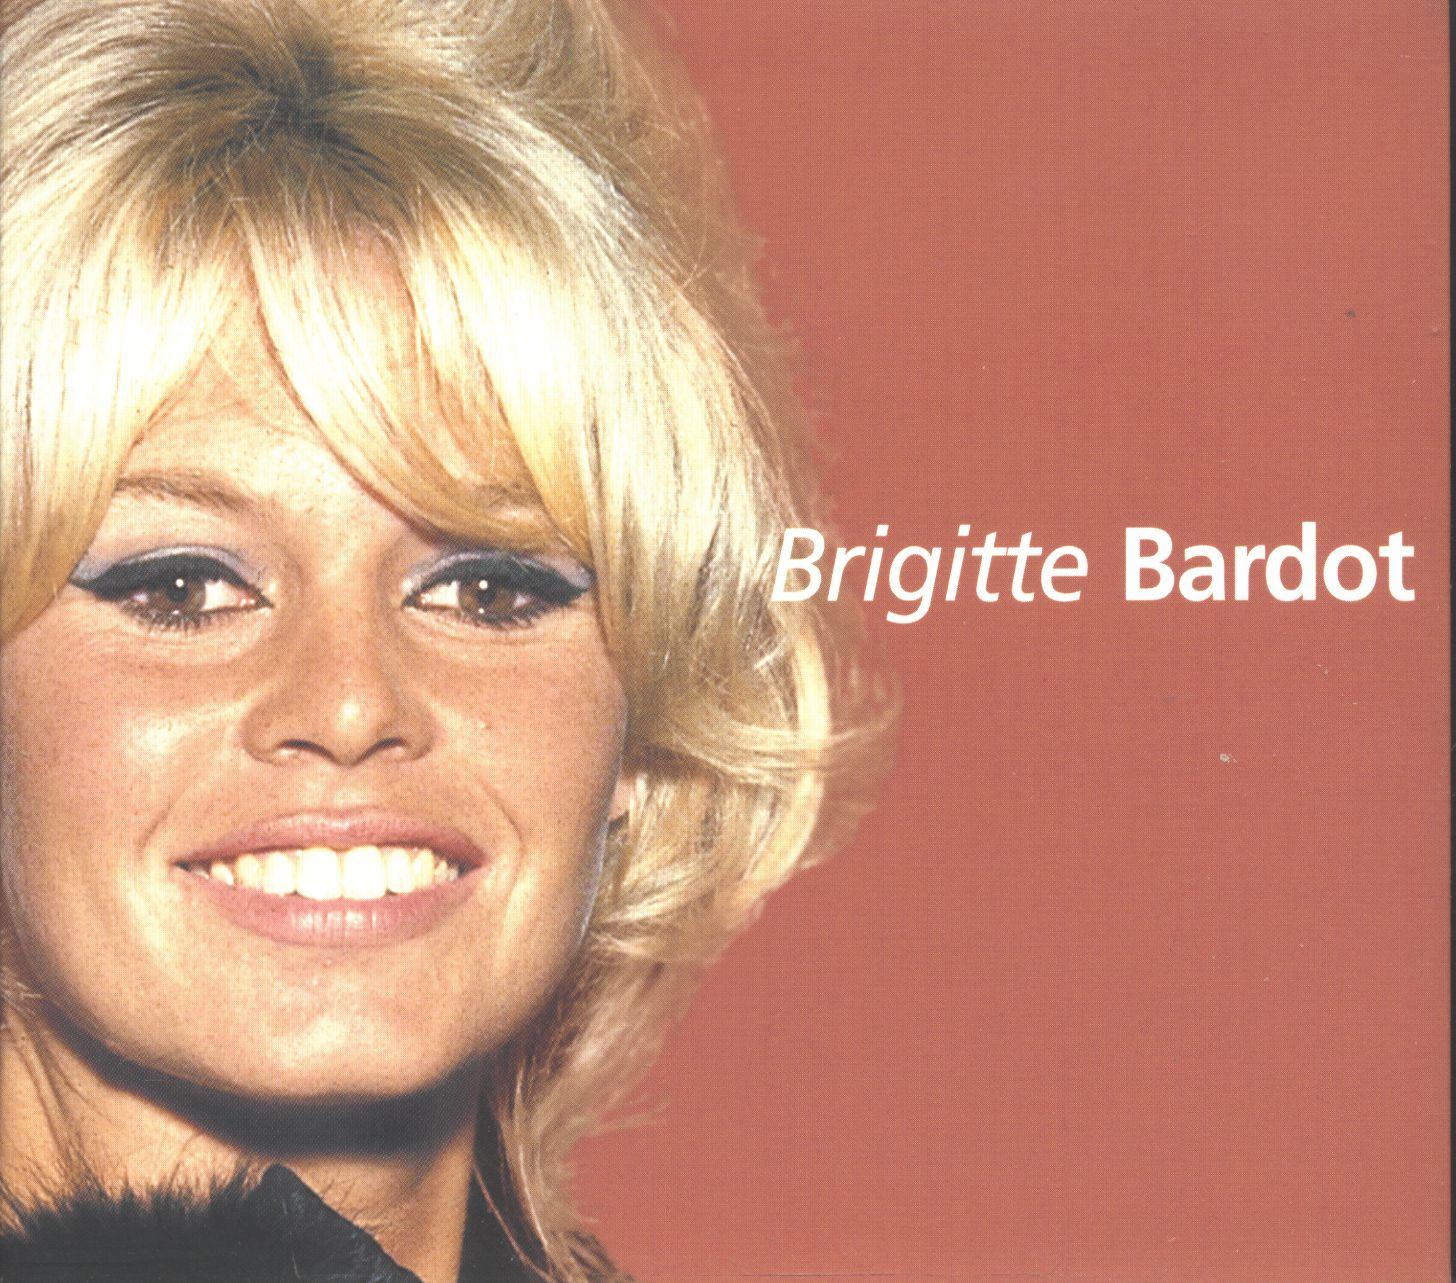 brigitte bardot brigitte bardot cd limited edition pop vocal ebay. Black Bedroom Furniture Sets. Home Design Ideas